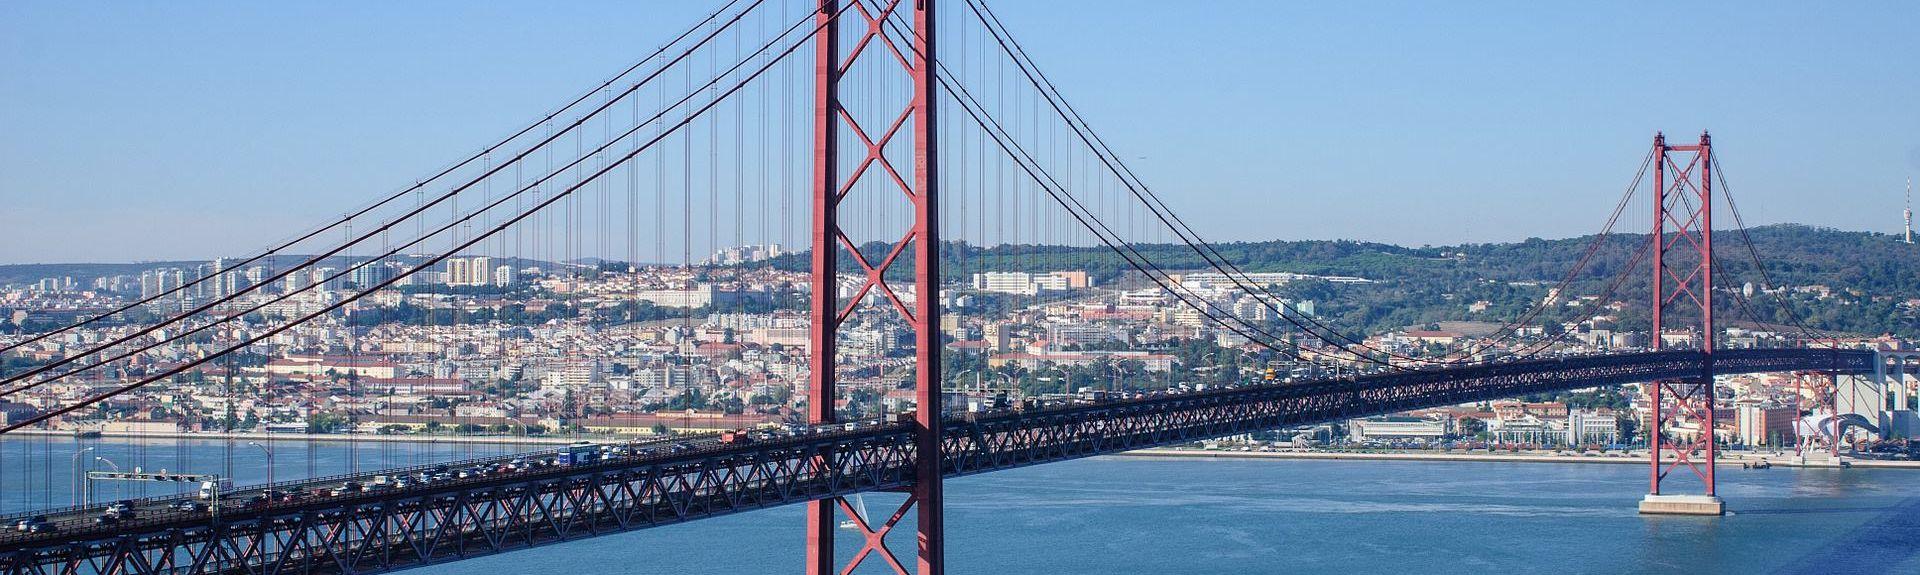 Santa Catarina, Lissabon, Distrikt Lissabon, Portugal